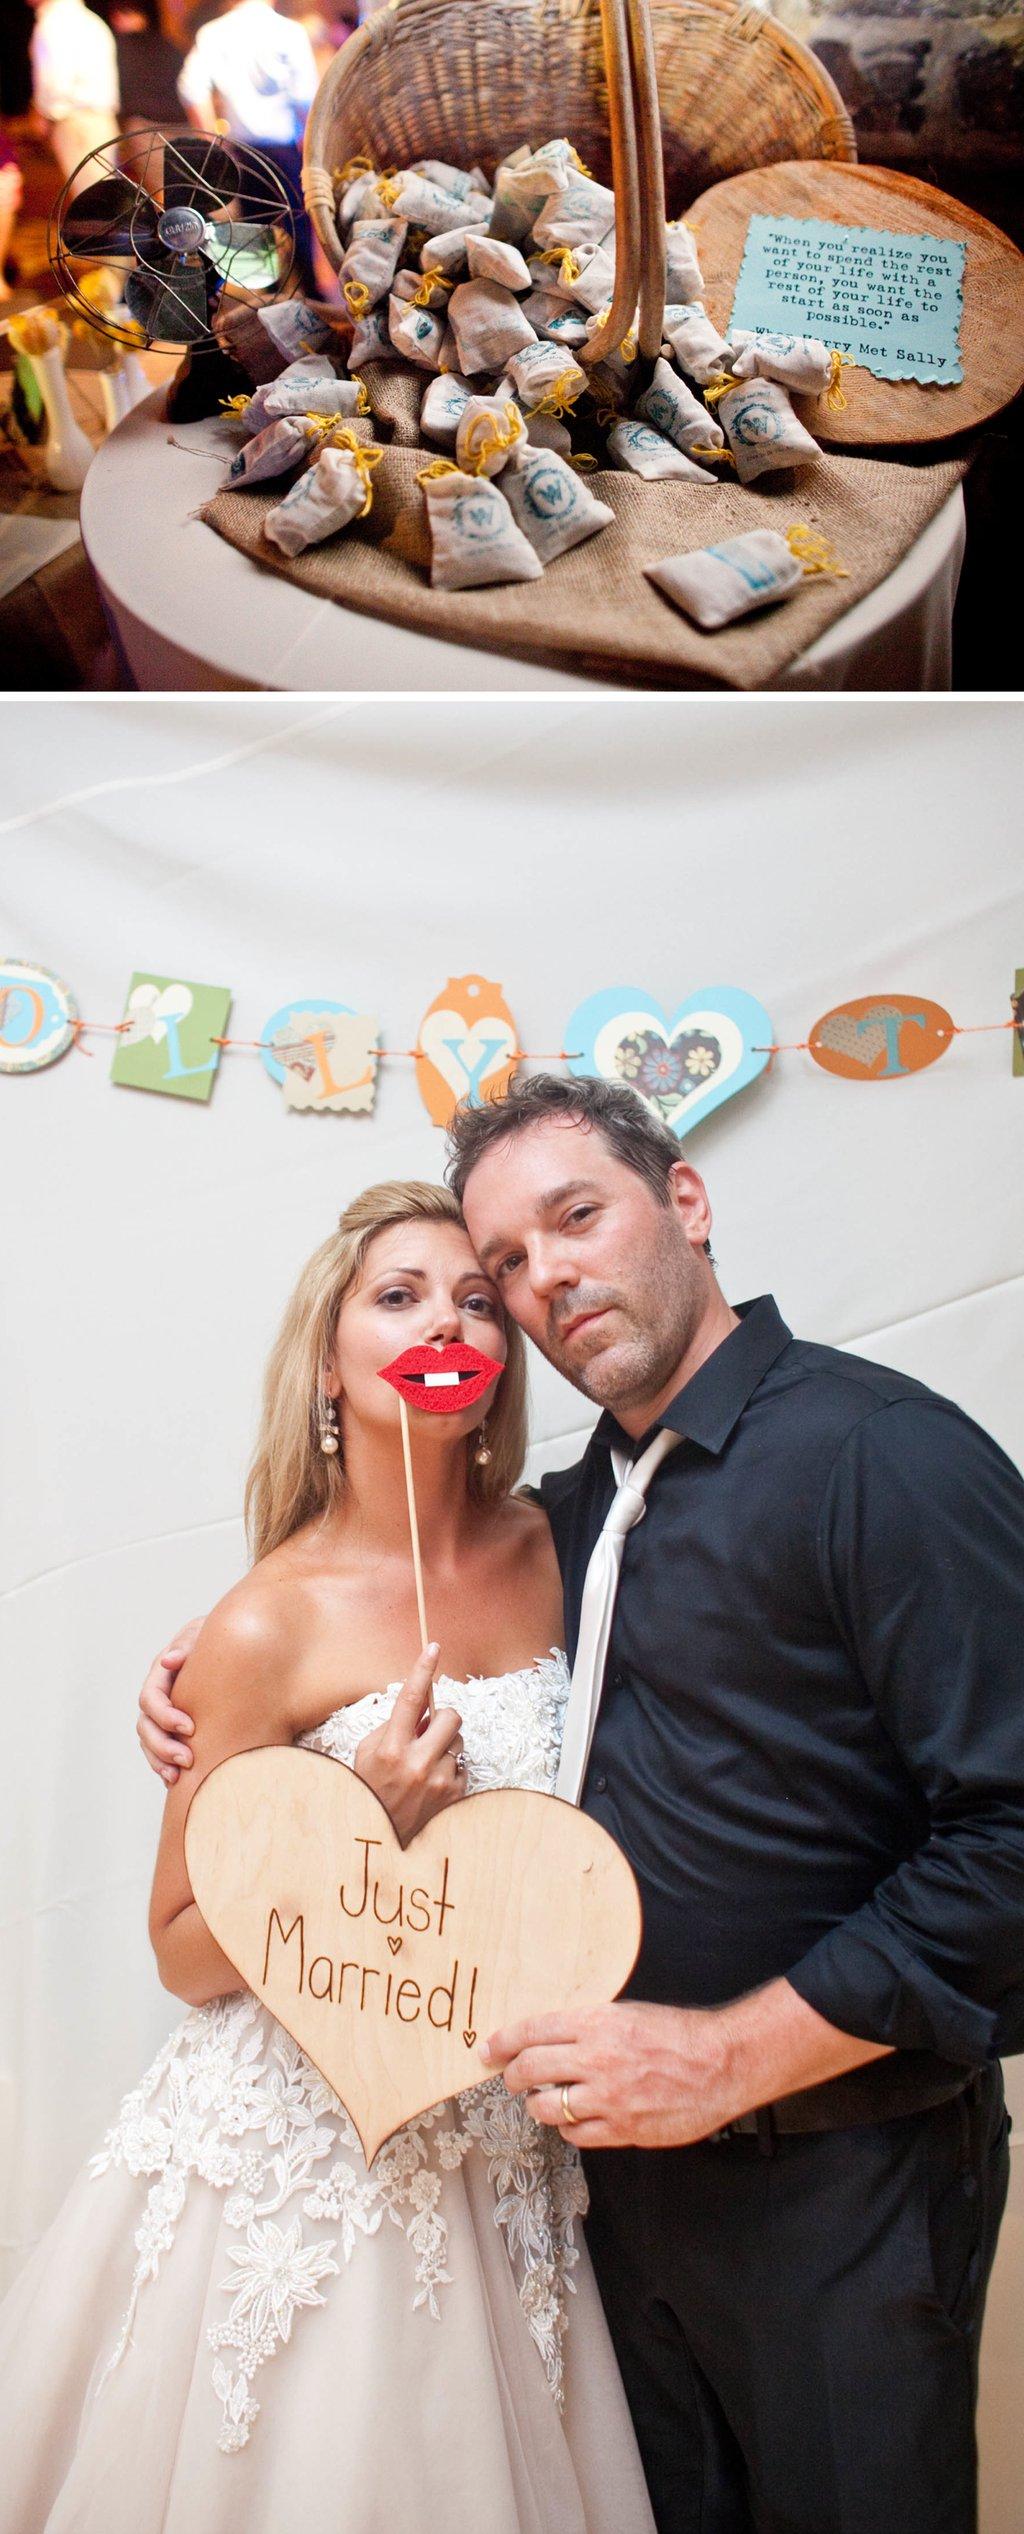 Bride-groom-wedding-reception-fun-photobooth.full